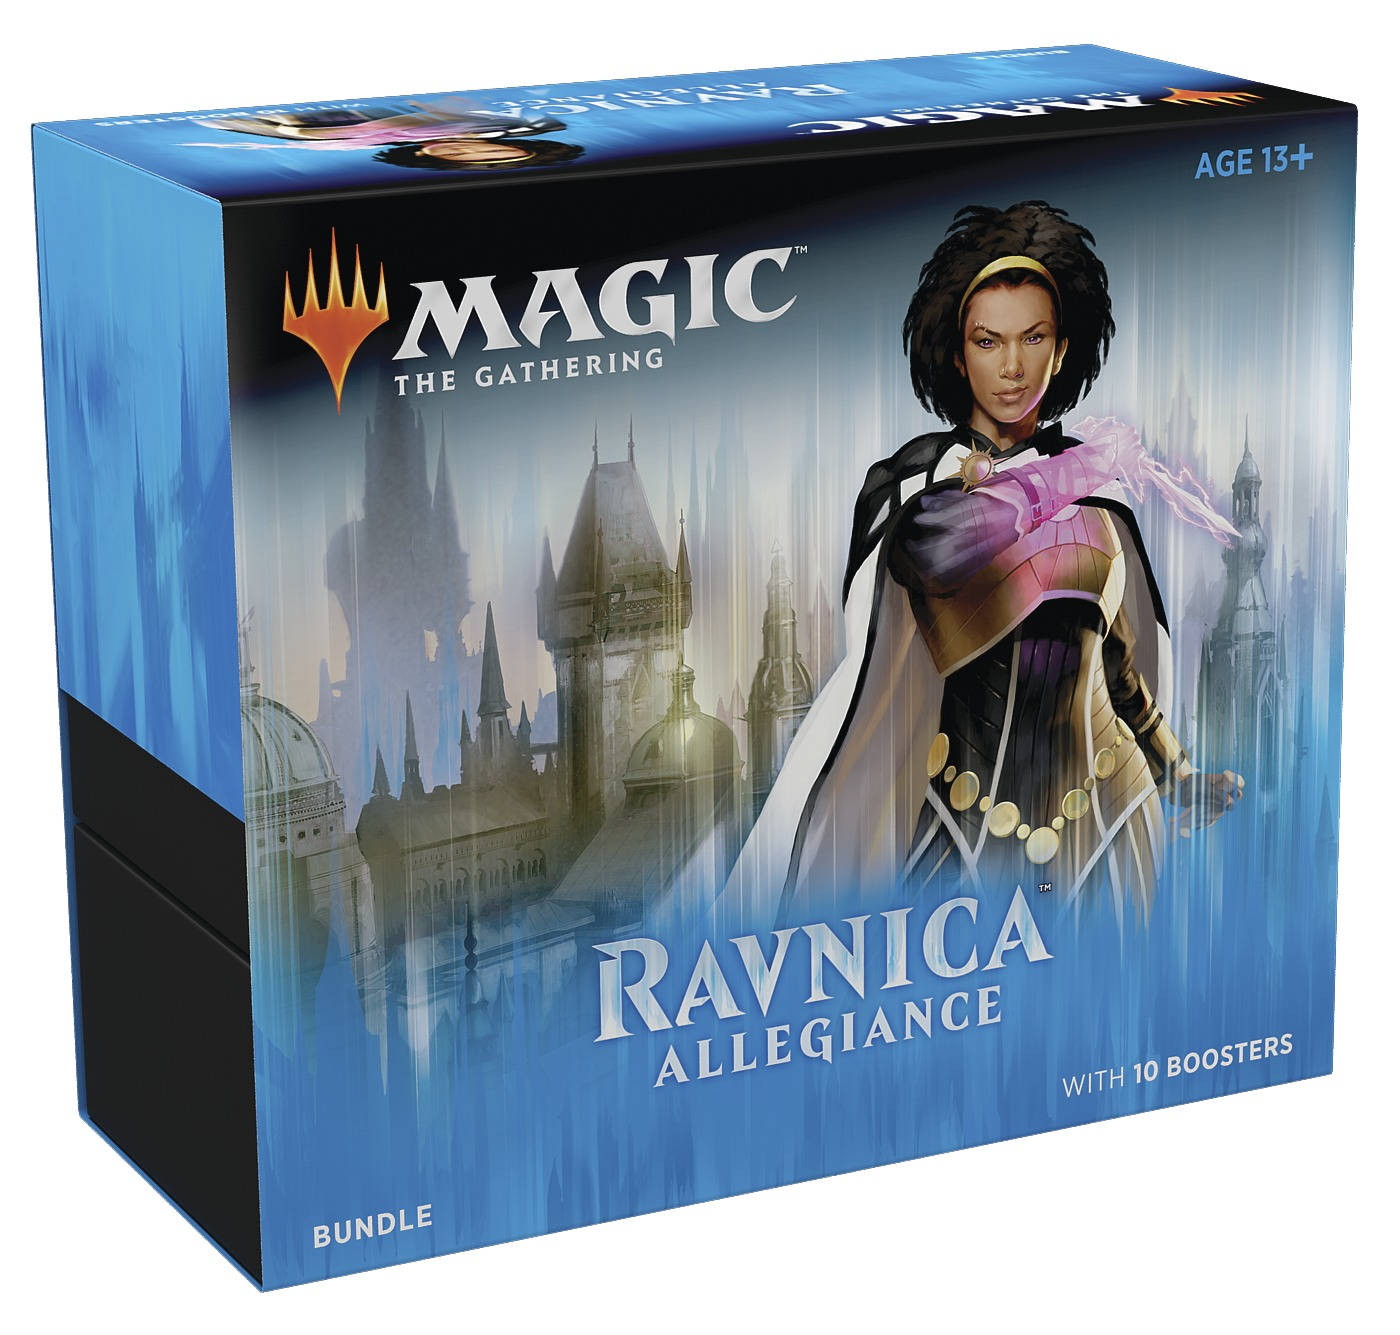 Magic The Gathering: Ravnica Allegiance Bundle image